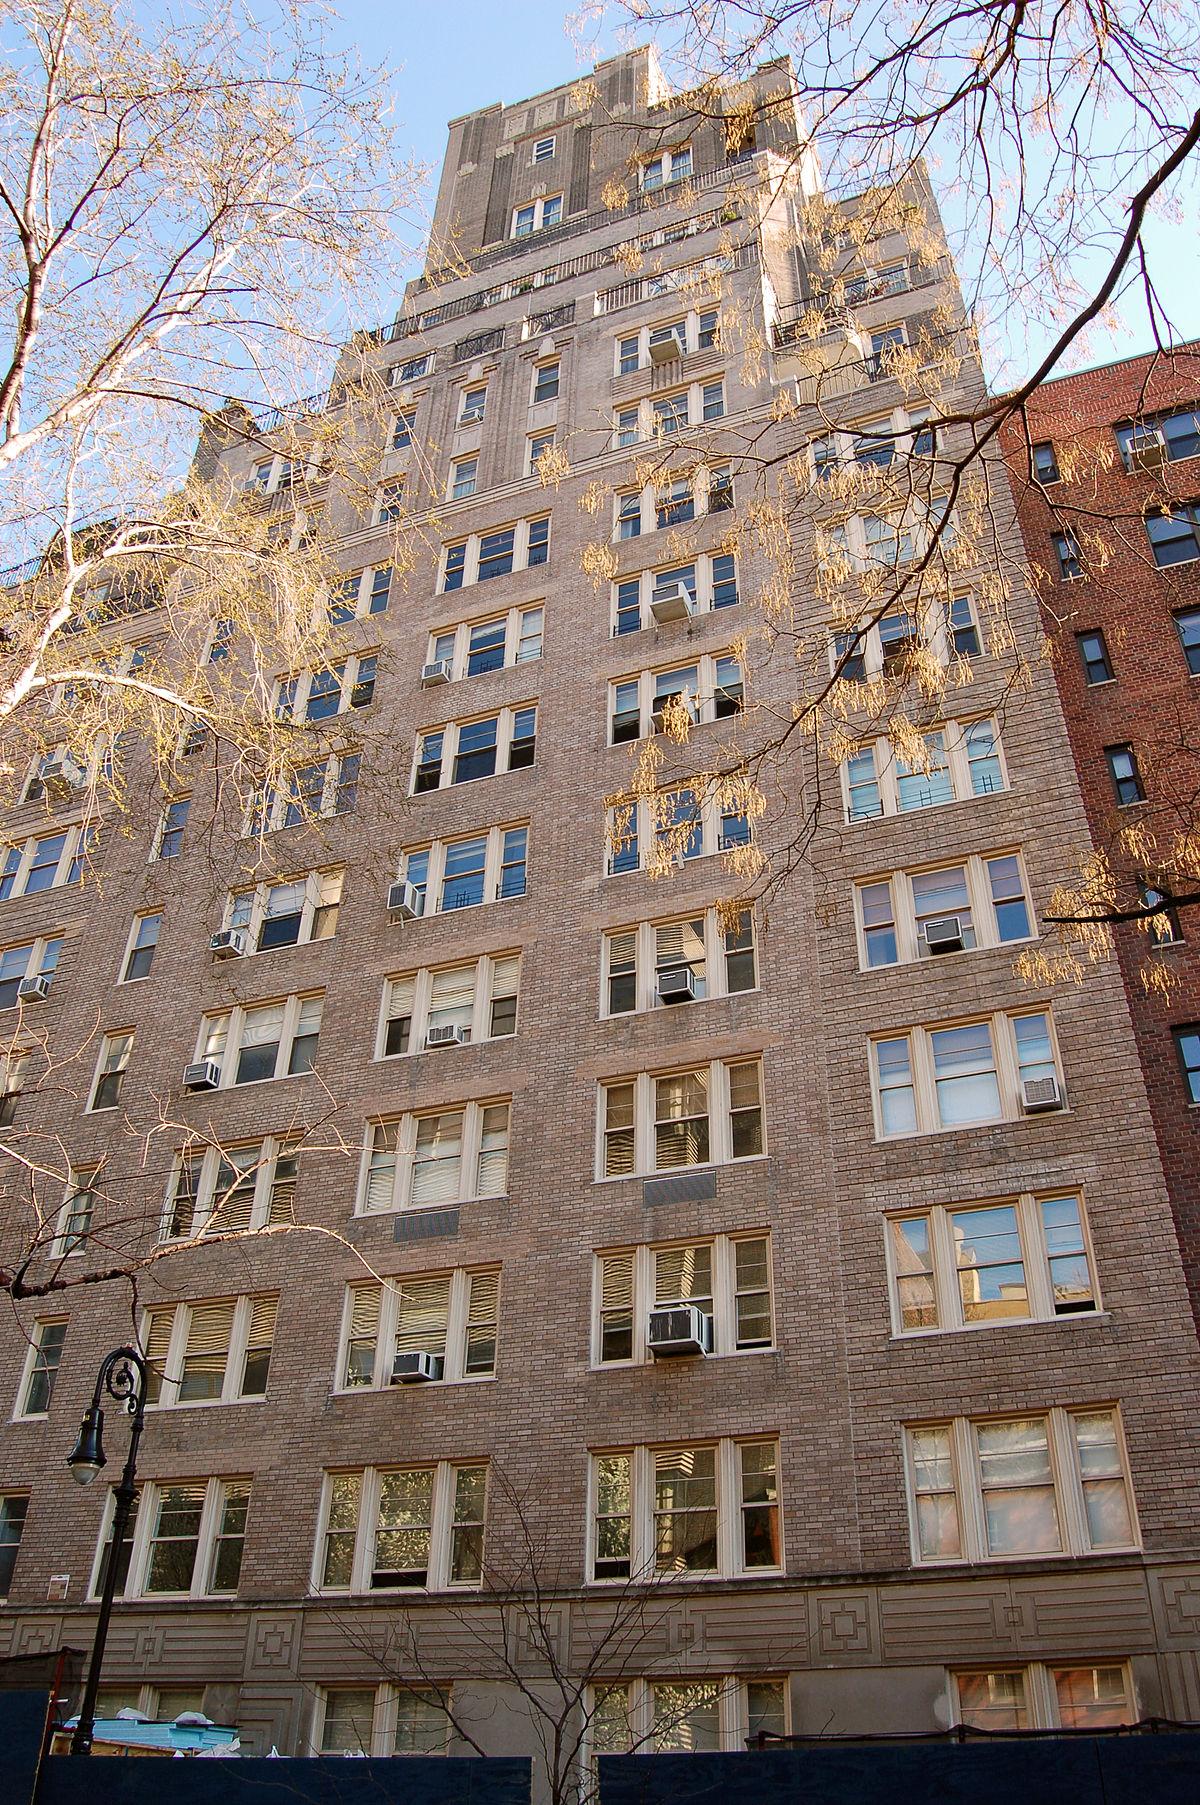 59 West 12th Street - Wikipedia